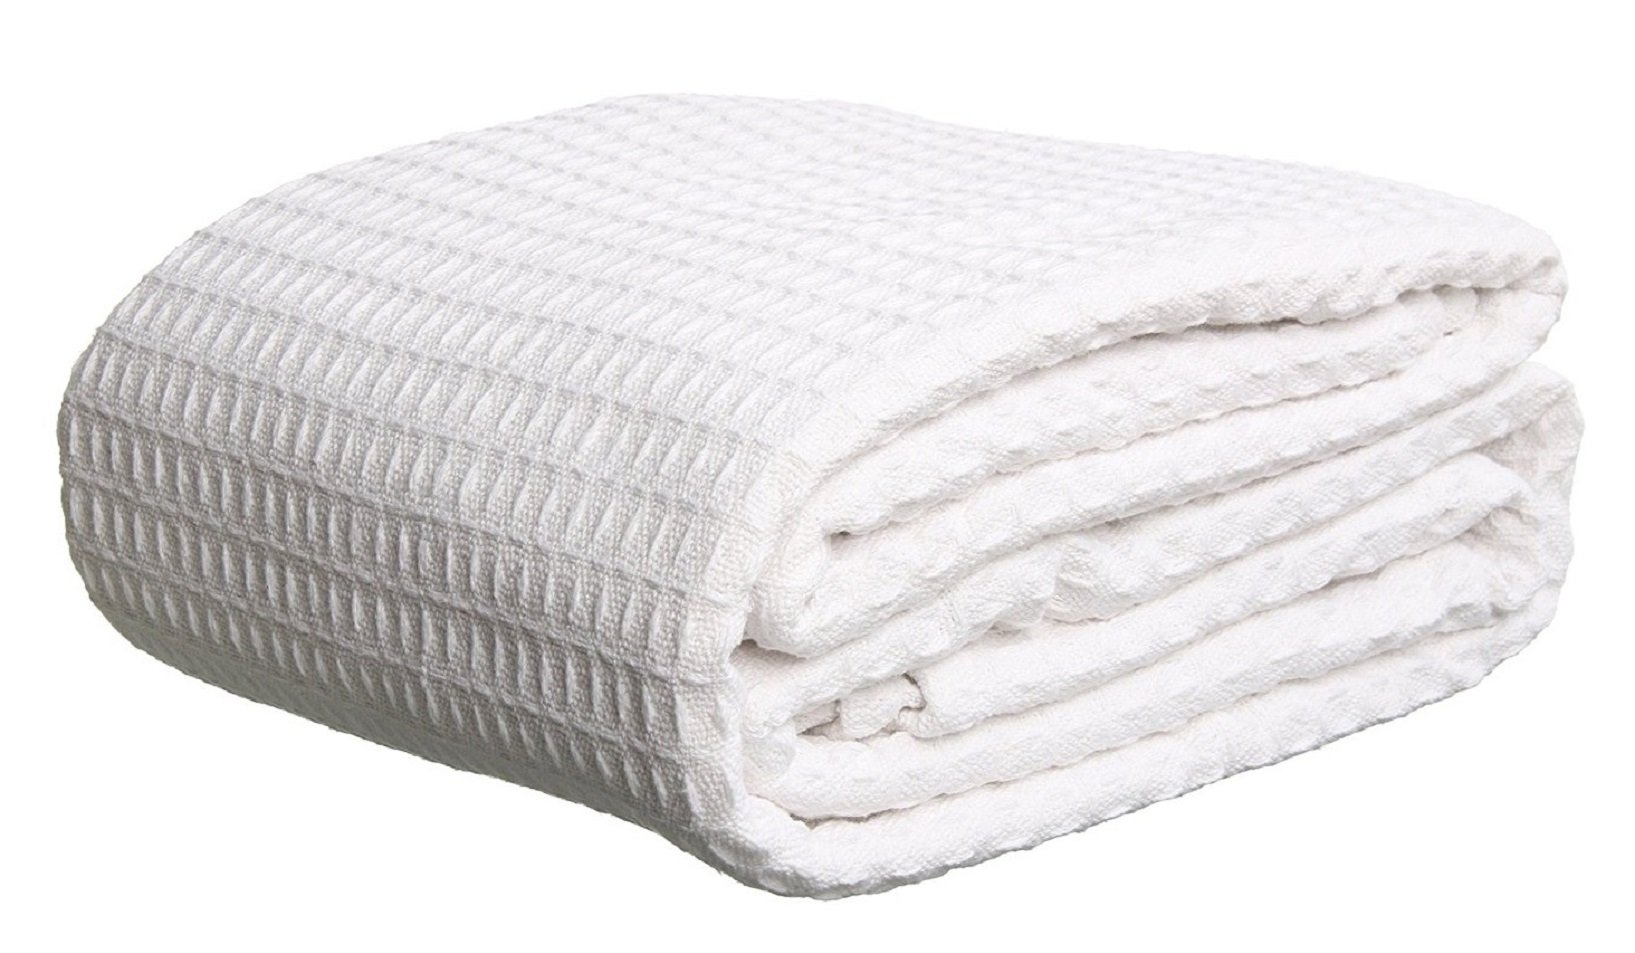 Elaine Karen Deluxe 100% Soft Cotton Thermal Waffle Weave Blanket - FULL Size - WHITE